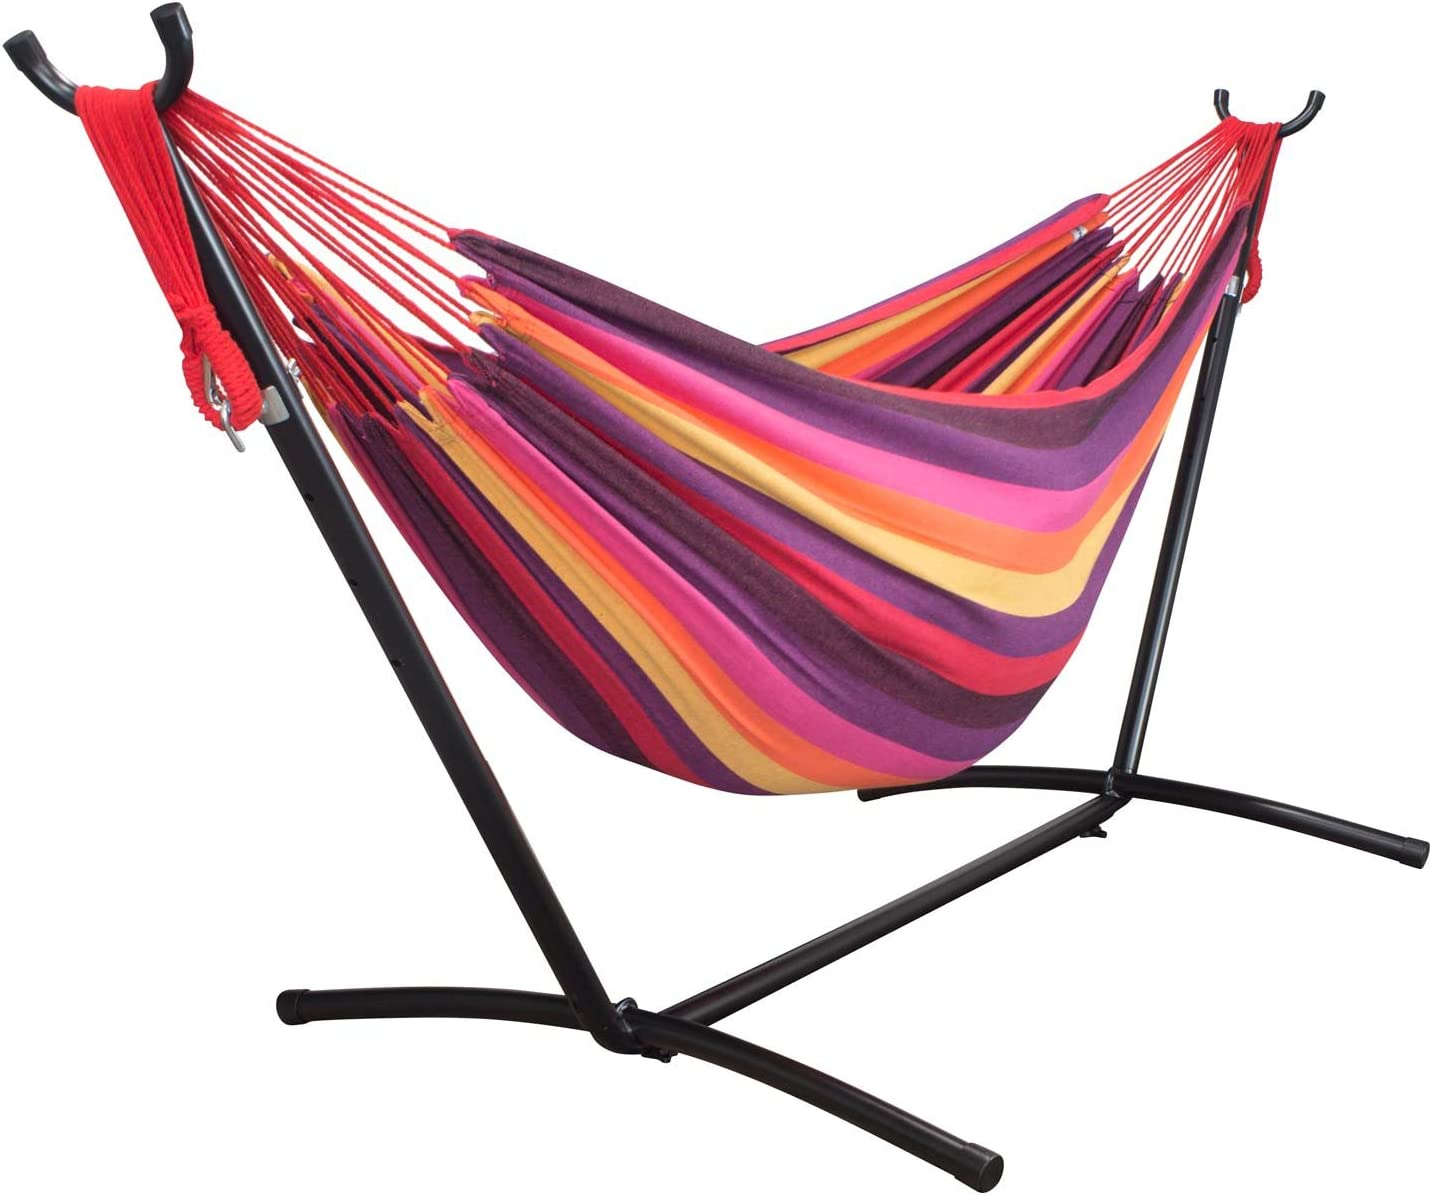 driftsun double hammock with steel stand   space saving two person lawn and patio portable hammock amazon    hammocks stands  u0026 accessories  patio lawn  u0026 garden      rh   amazon